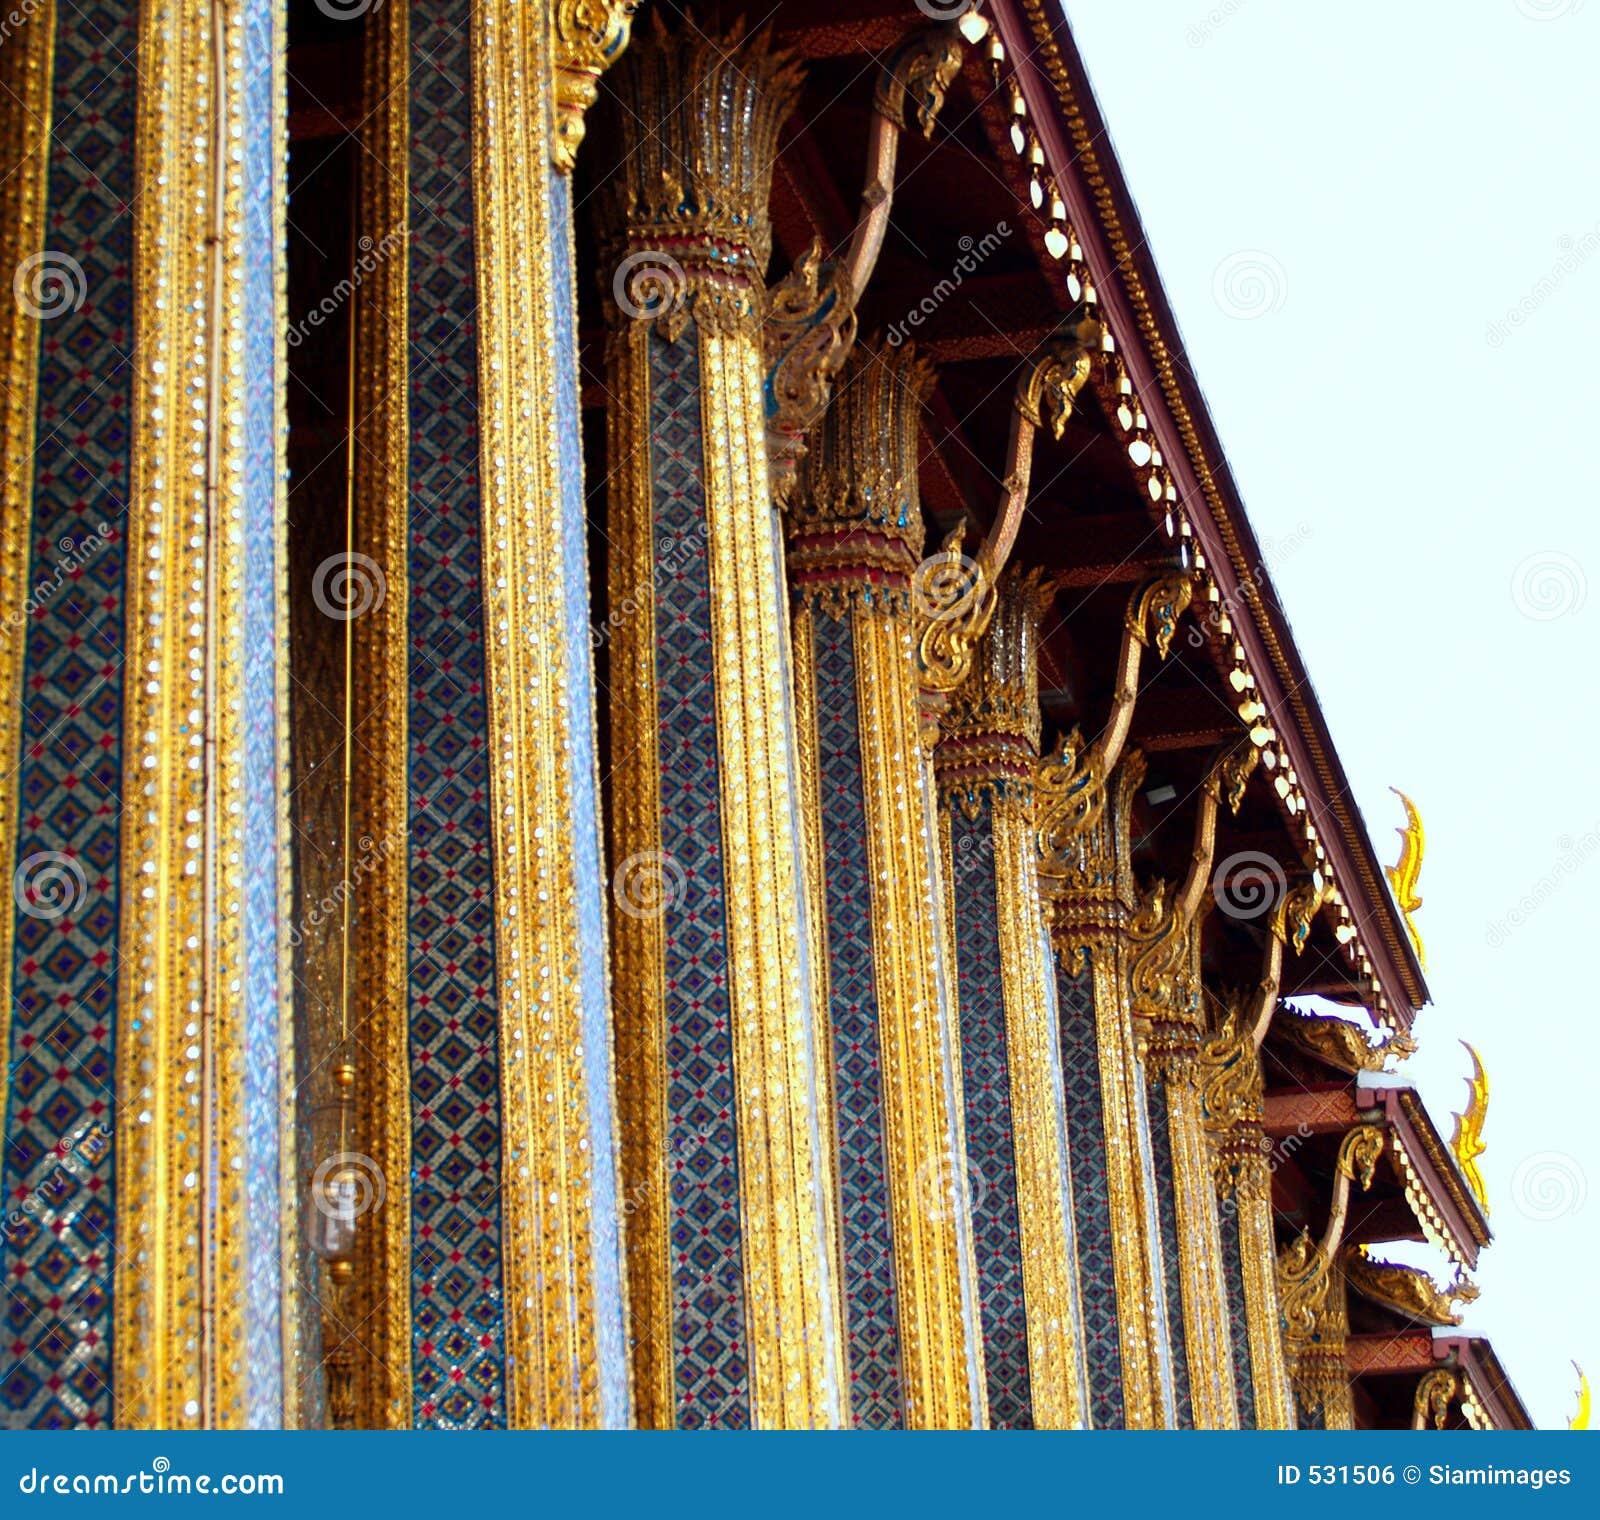 Download 结构prakaew样式wat 库存照片. 图片 包括有 放松, 轰隆的, 发芽, 崇拜, 旅行, 宗教信仰, 观光 - 531506